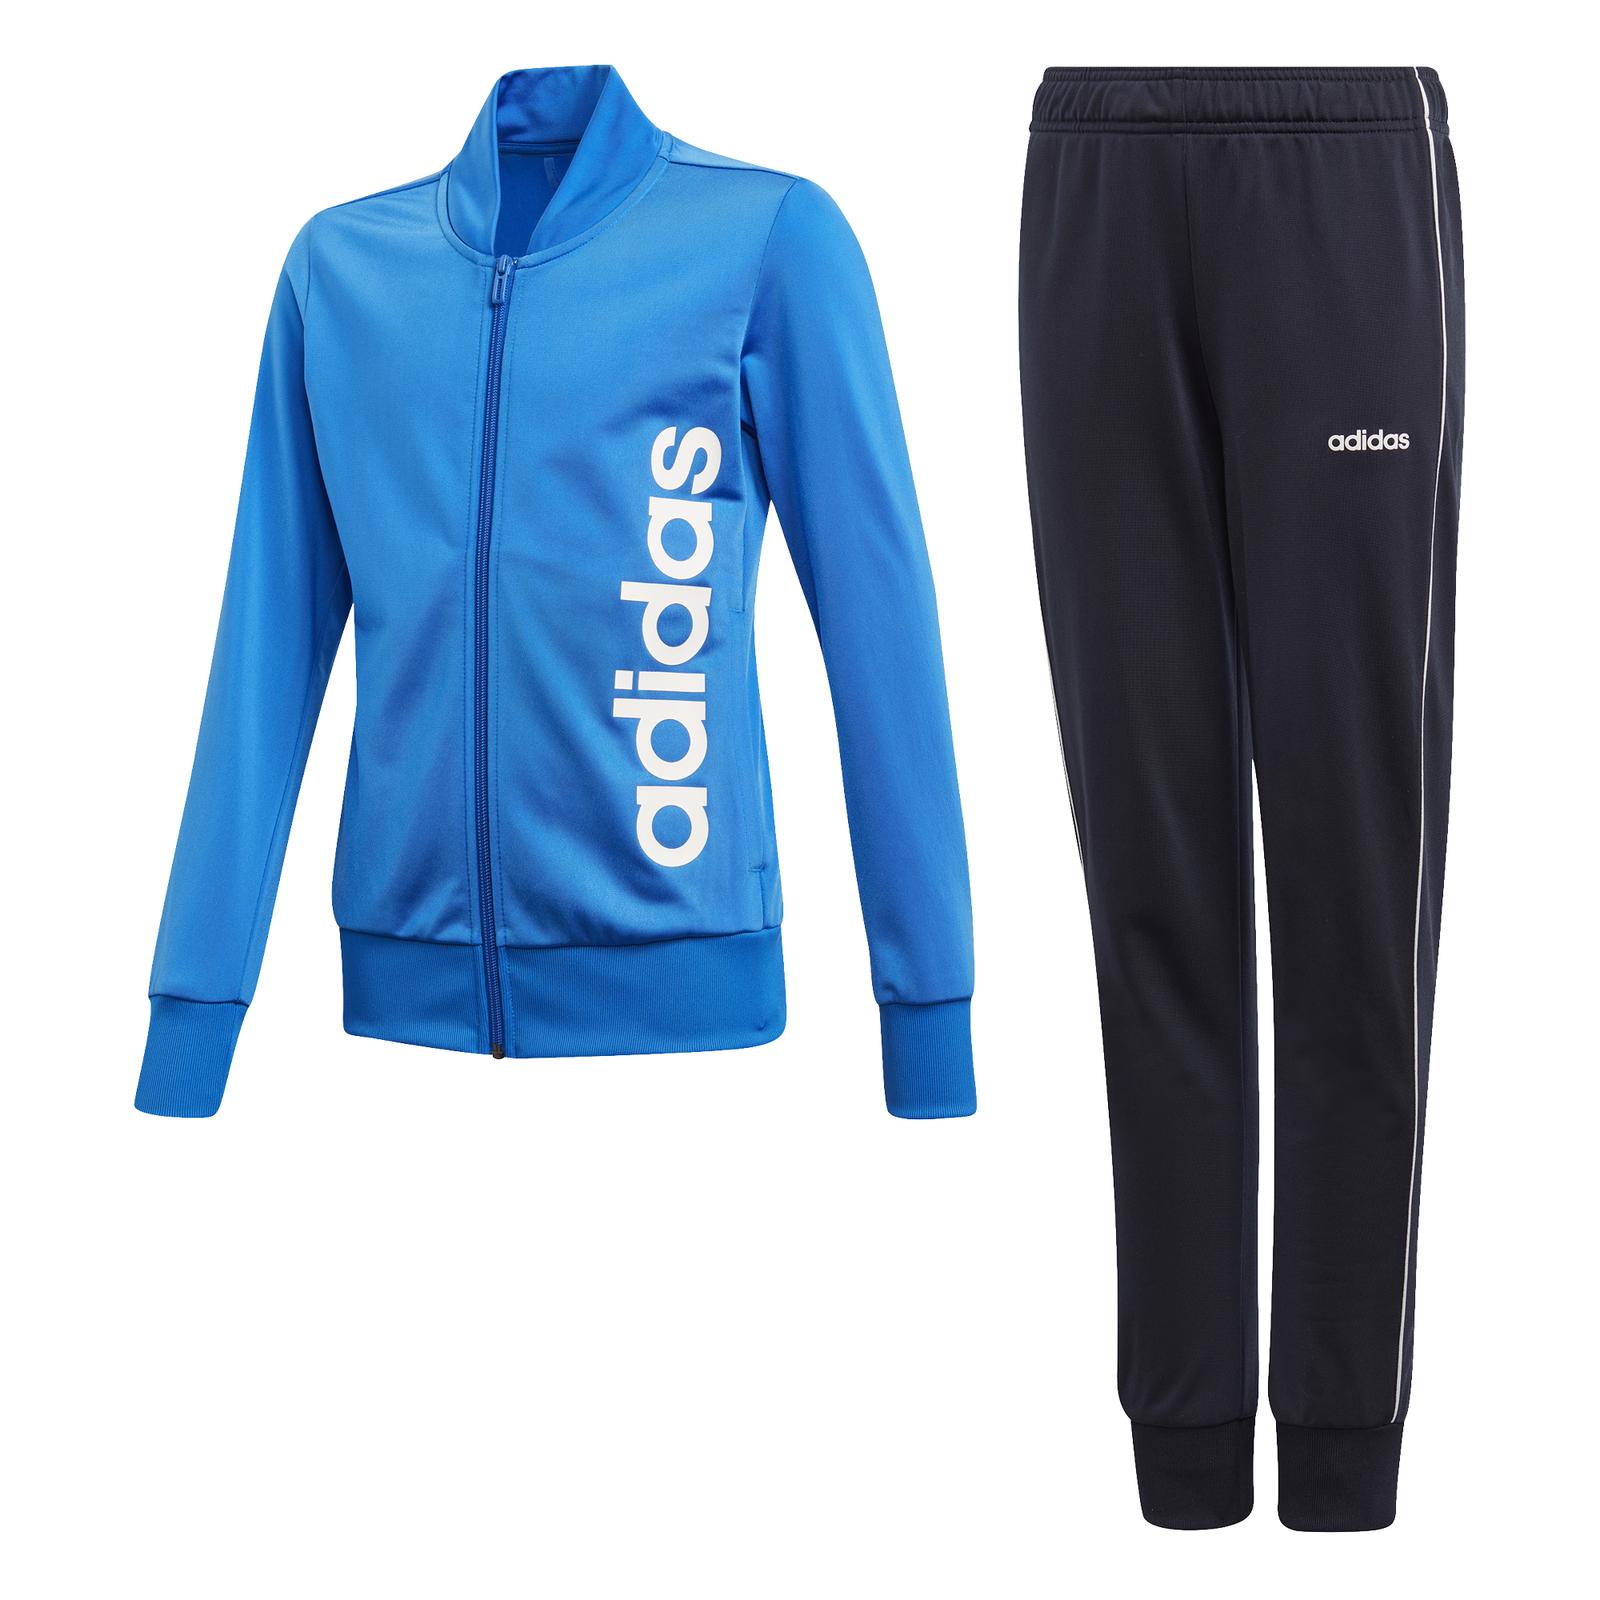 Details zu adidas Performance Mädchen Trainingsanzug Polyester Tracksuit blau